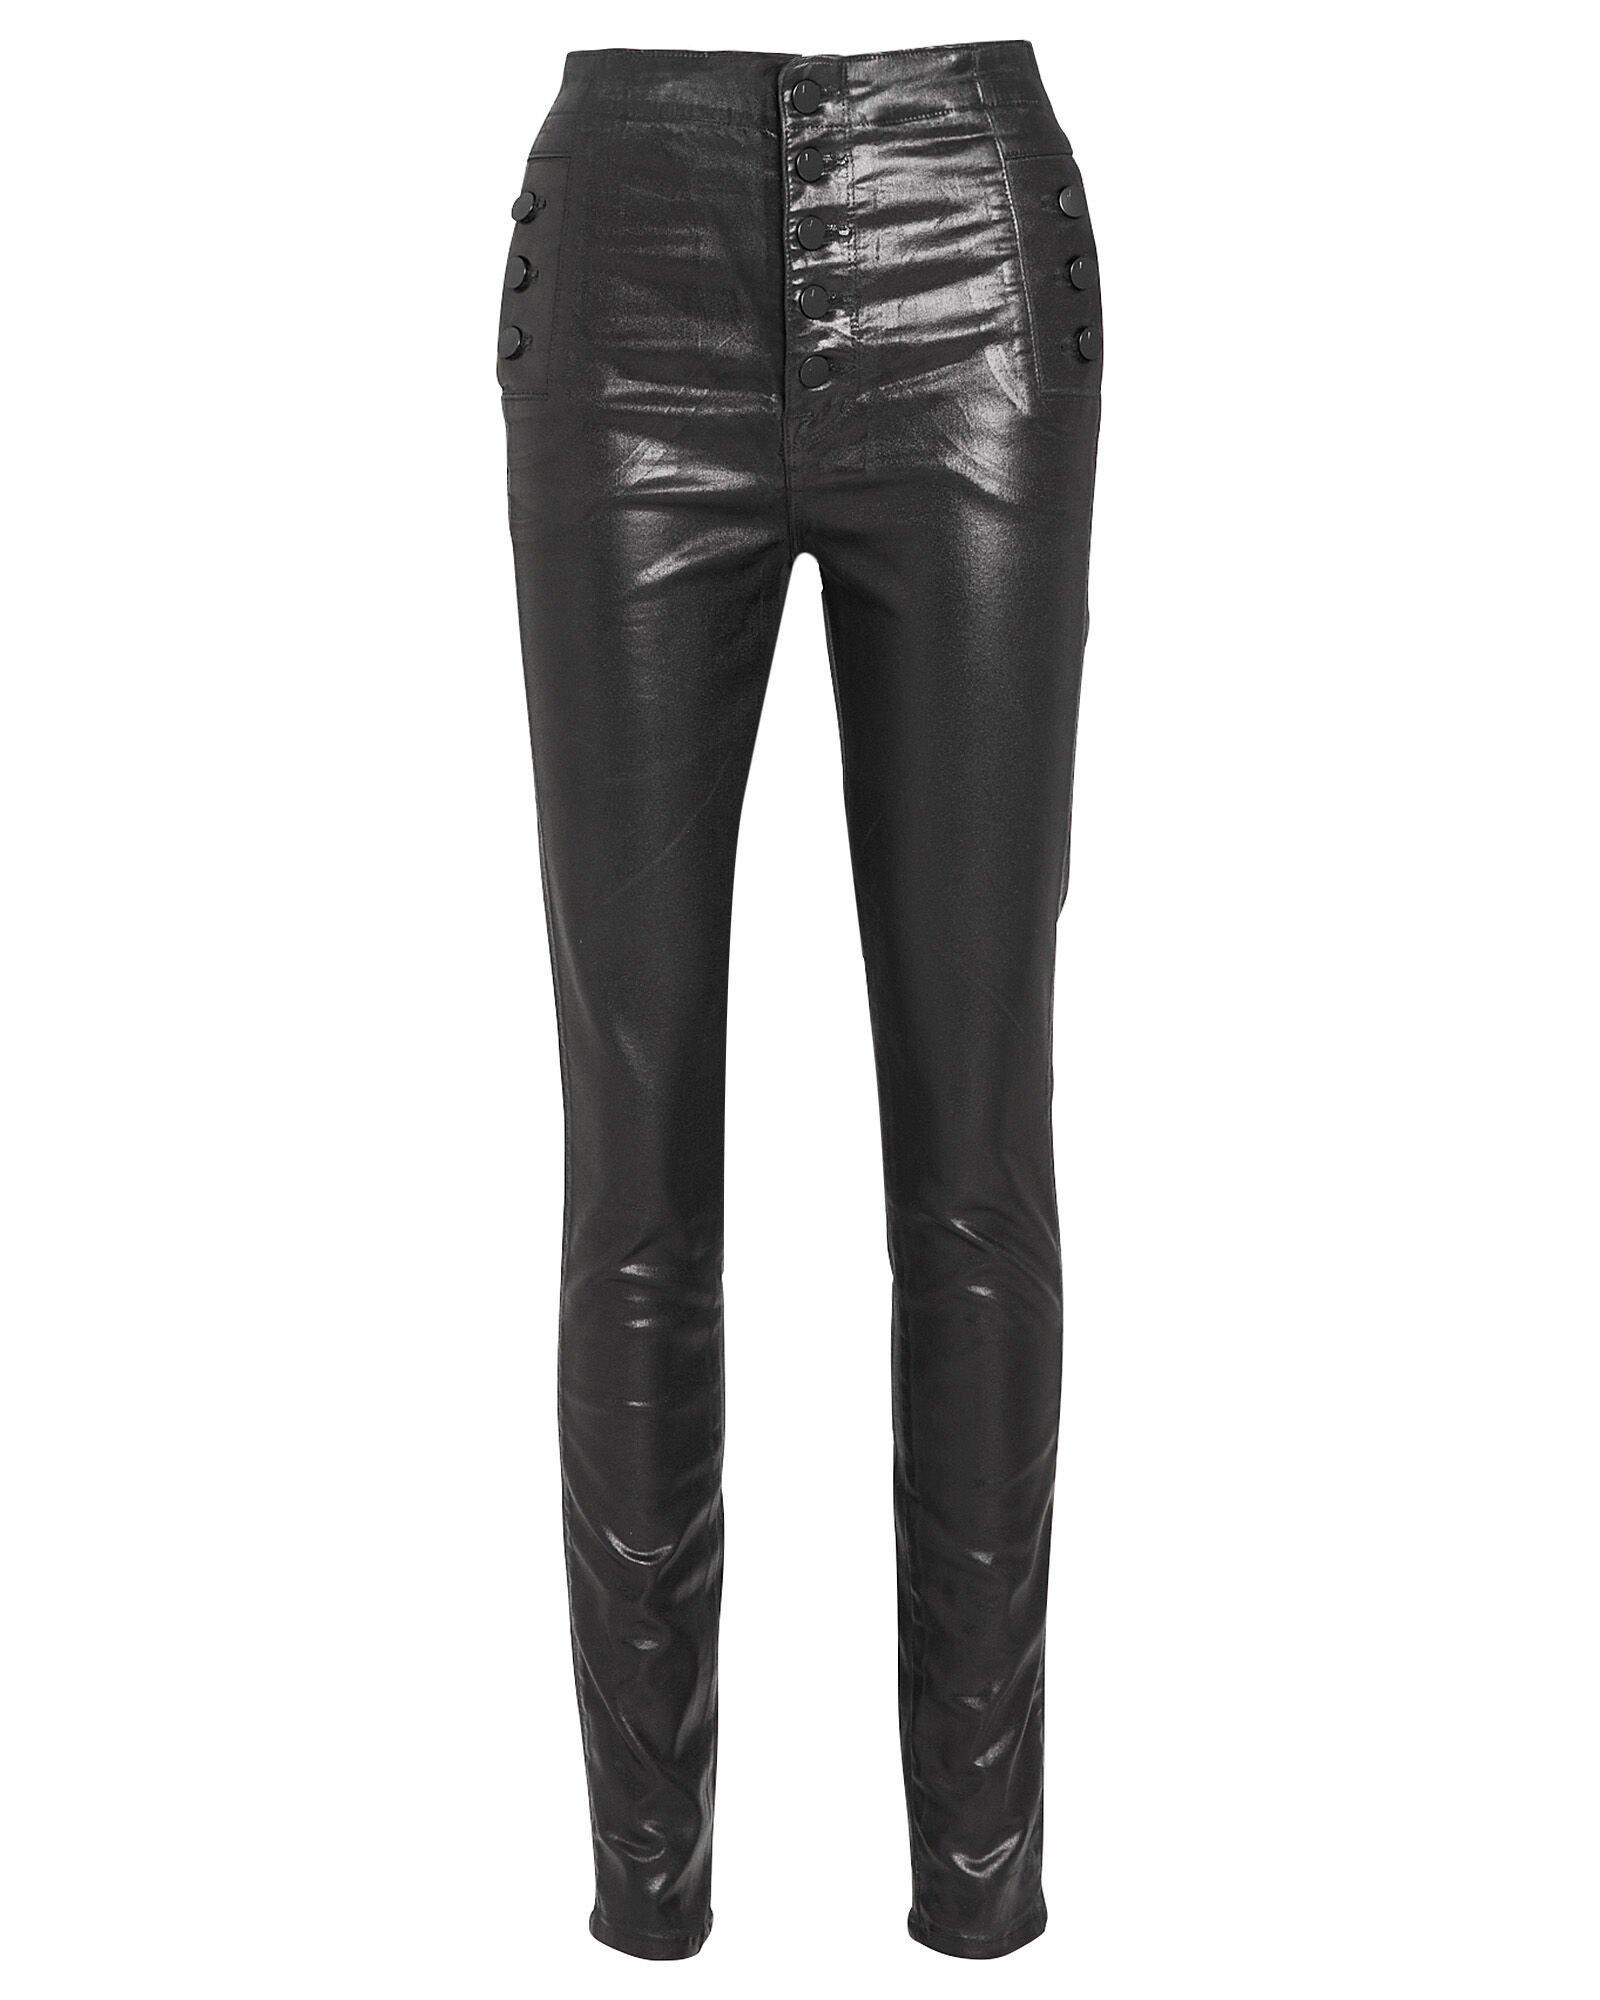 Women's Skinny Black Leather Pants | J Brand